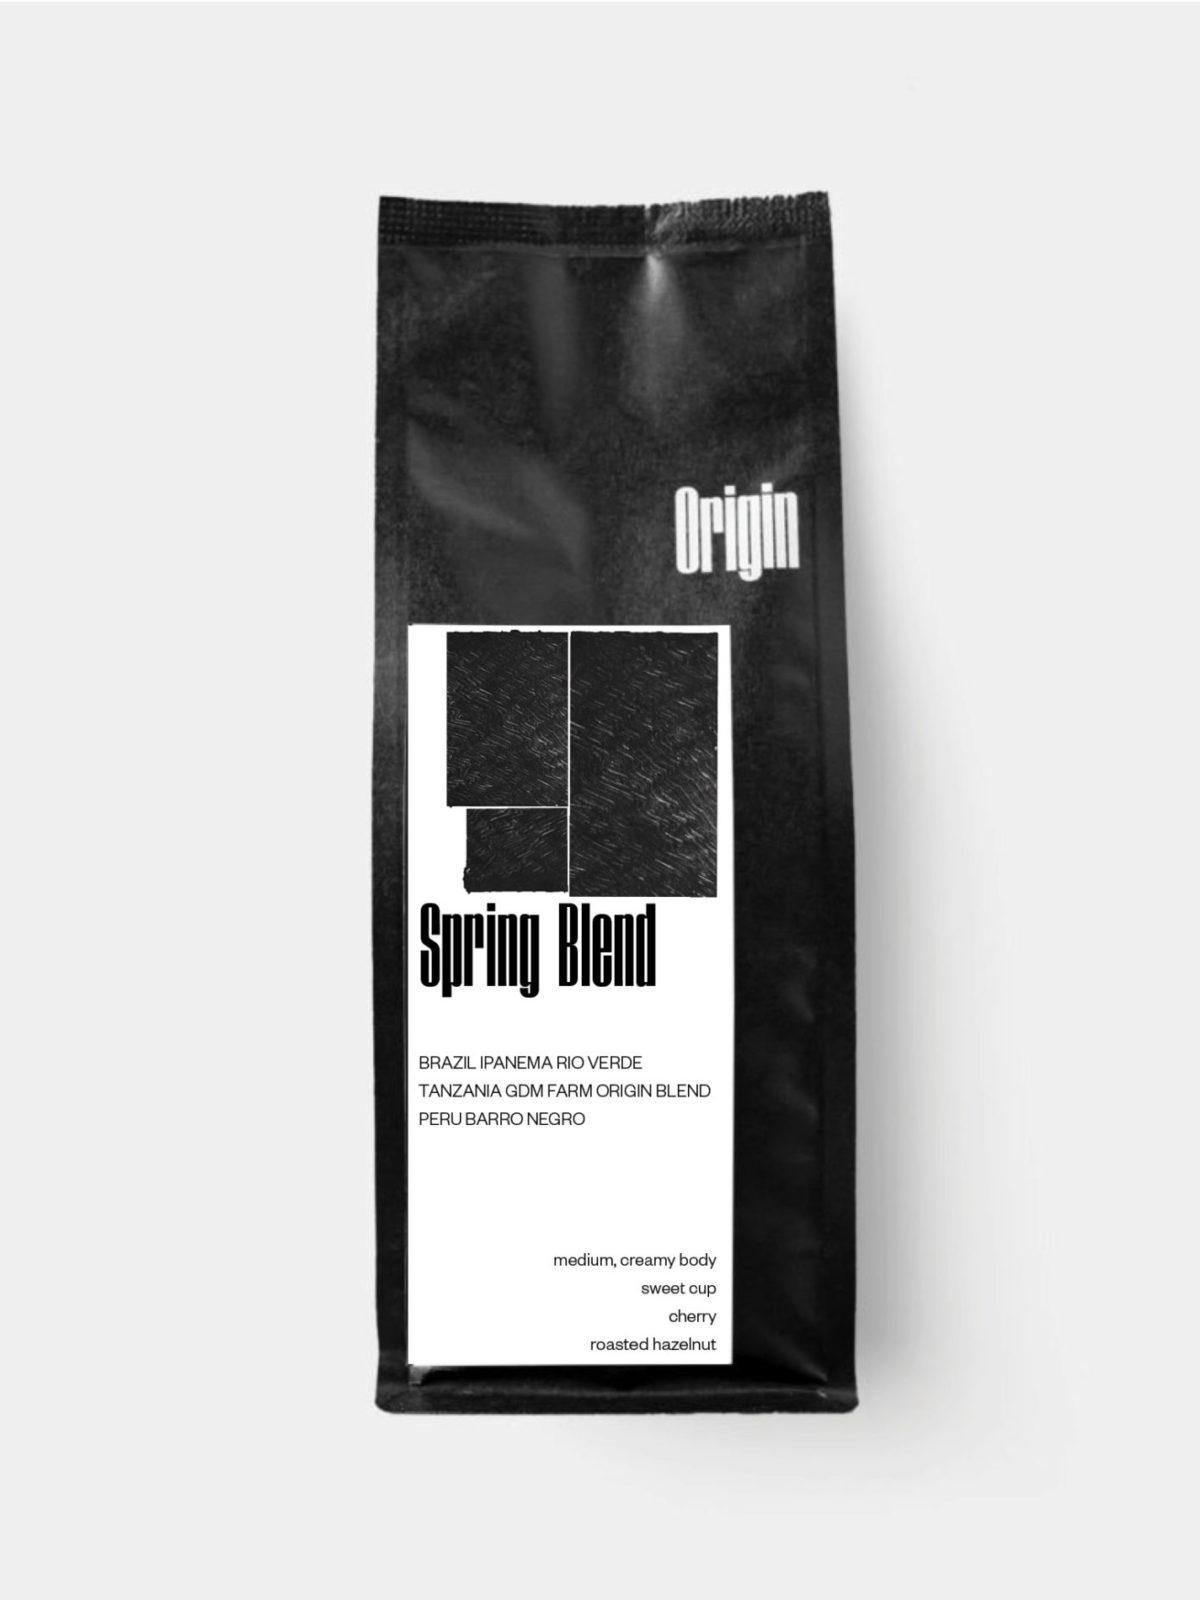 Spring Blend 2021 on the 250g bag